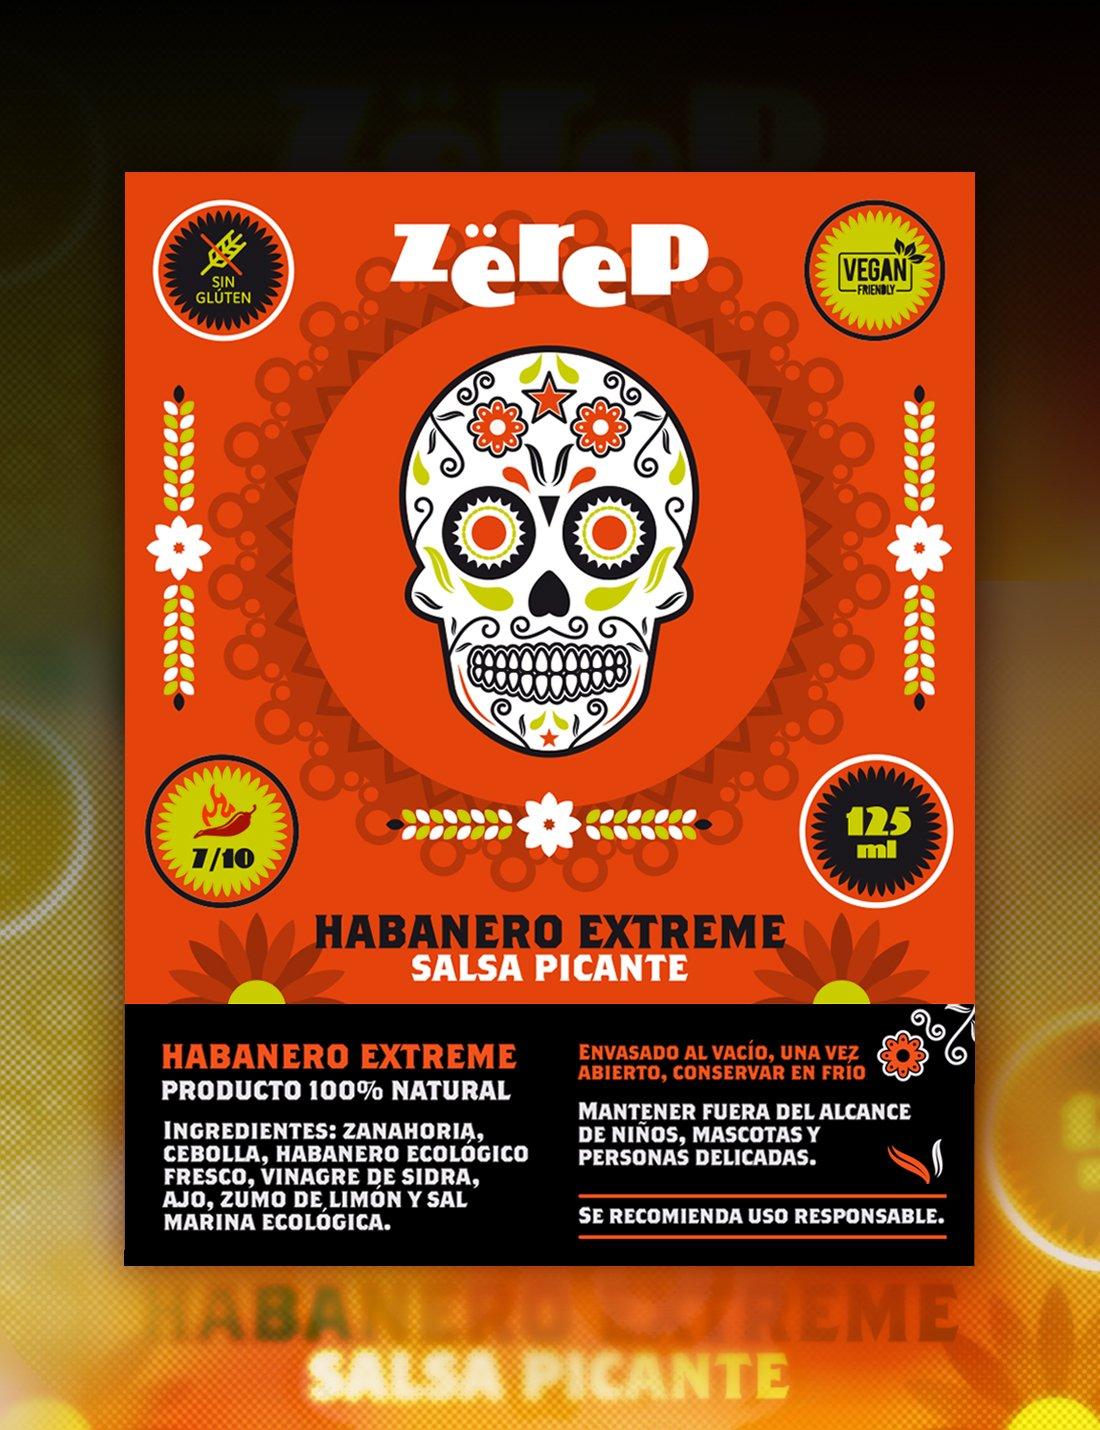 Zëreps Salsa de Chile Habanero Muy Picante Habanero Extreme - 125 ML. Hecha con Chile Habanero Natural, Zanahoria, Cebolla, Vinagre de Sidra, Ajo, ...